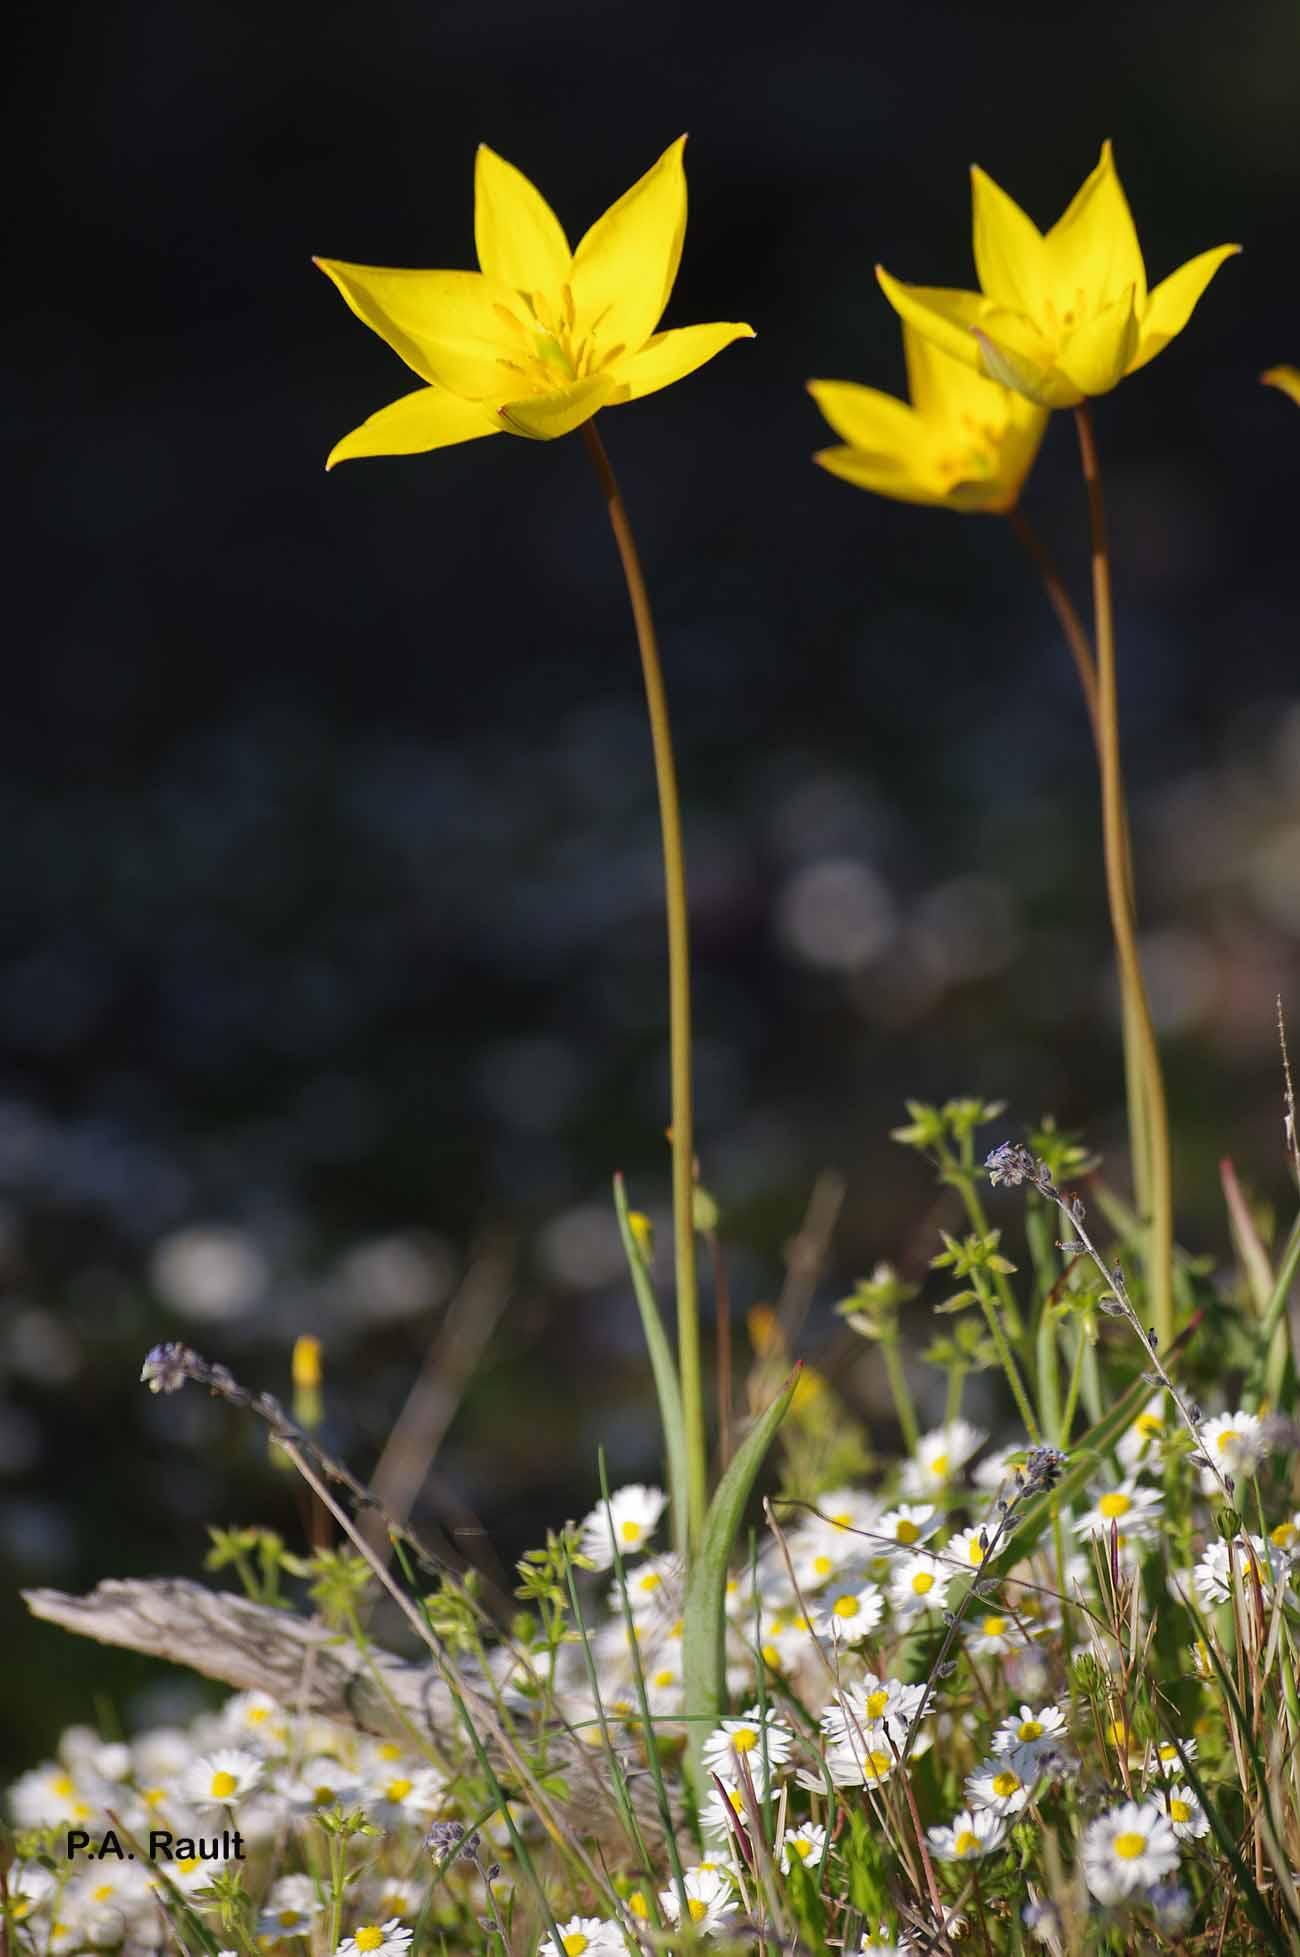 Tulipa sylvestris subsp. sylvestris